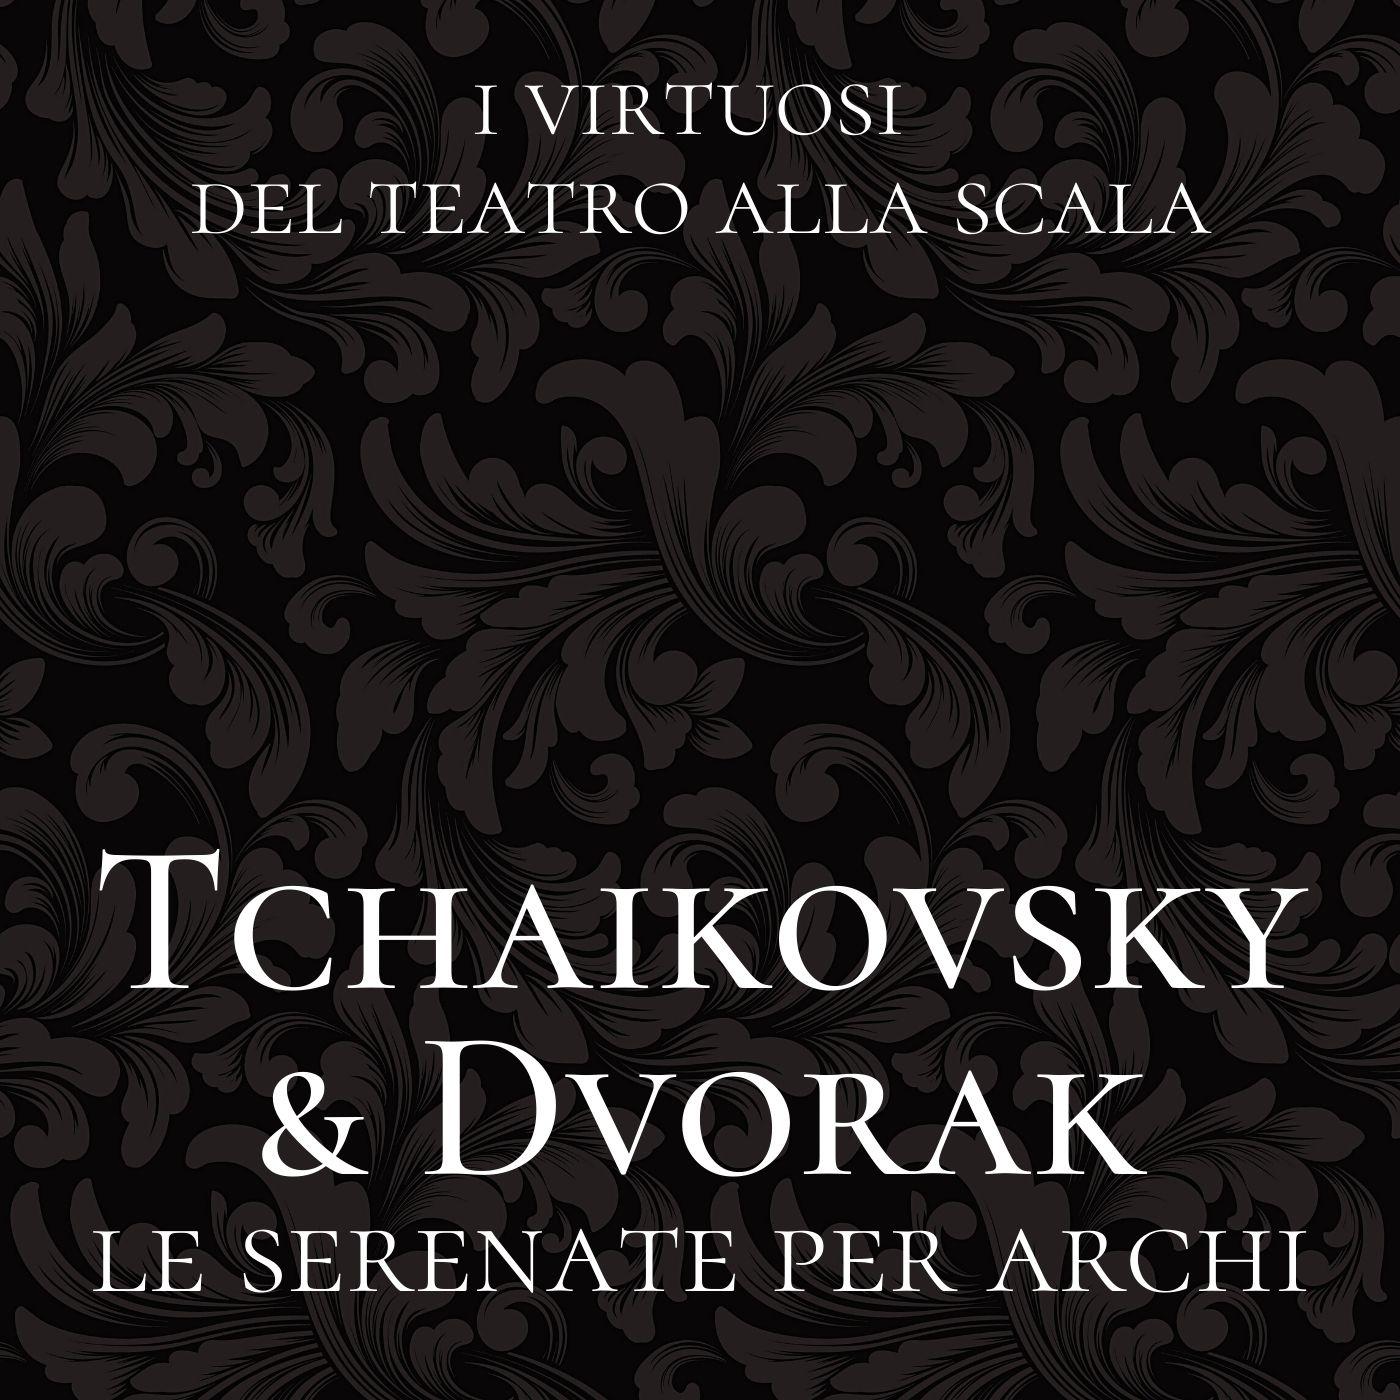 Tchaikovsky & Dvorak: Le serenate per archi